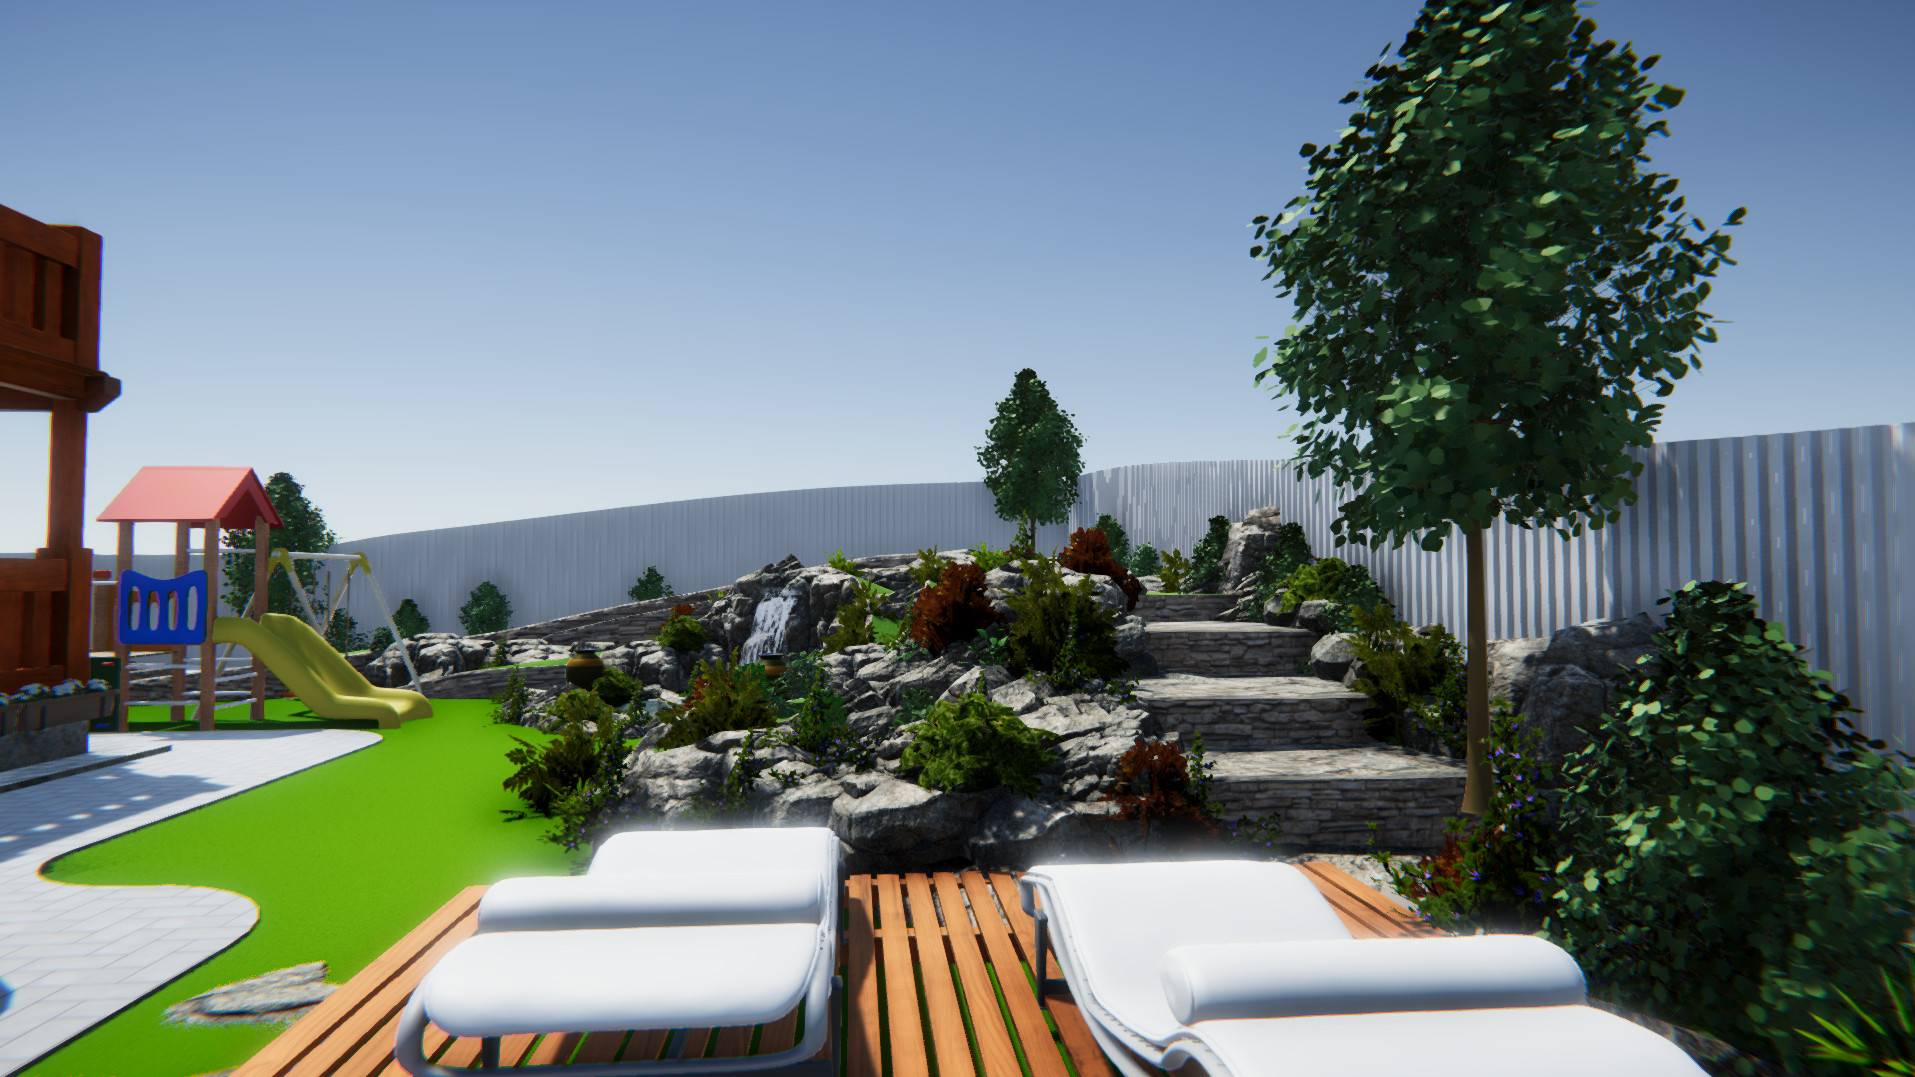 Ландшафтный дизайн участка 10 соток фото f_996598b6f7fe55db.jpg